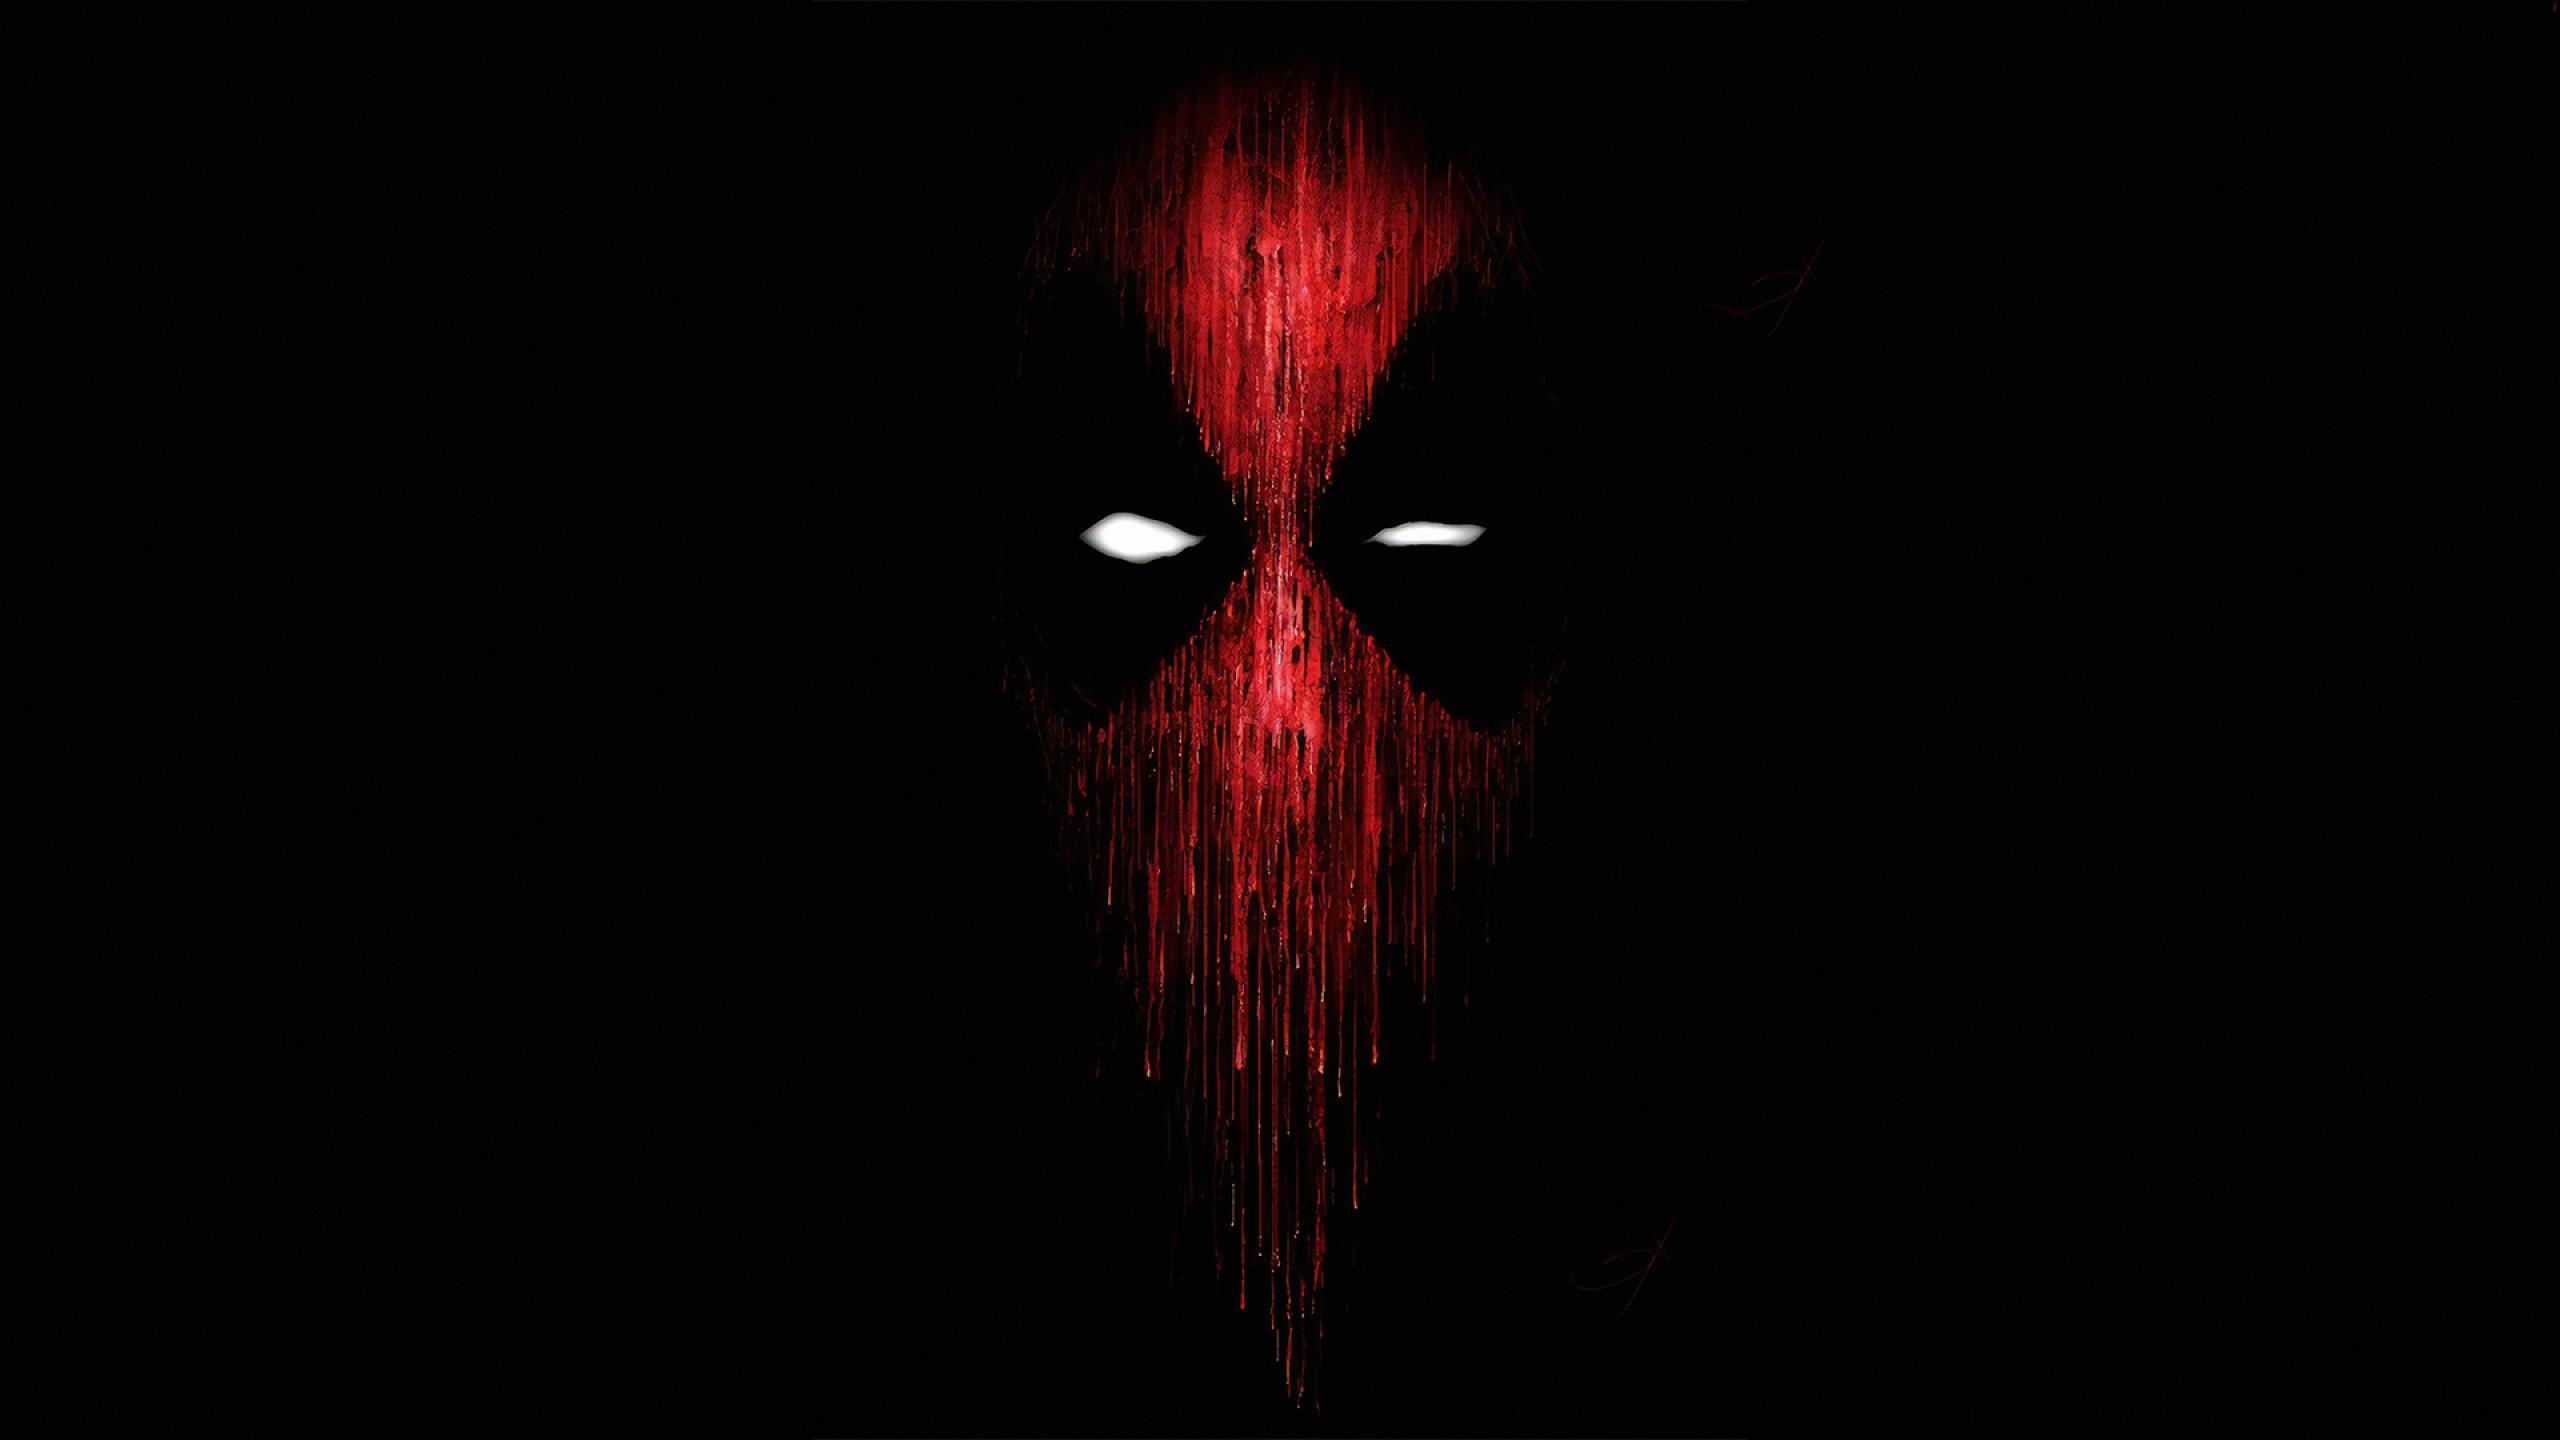 2560x1440 Deadpool Mask Minimalist 1440P Resolution ...